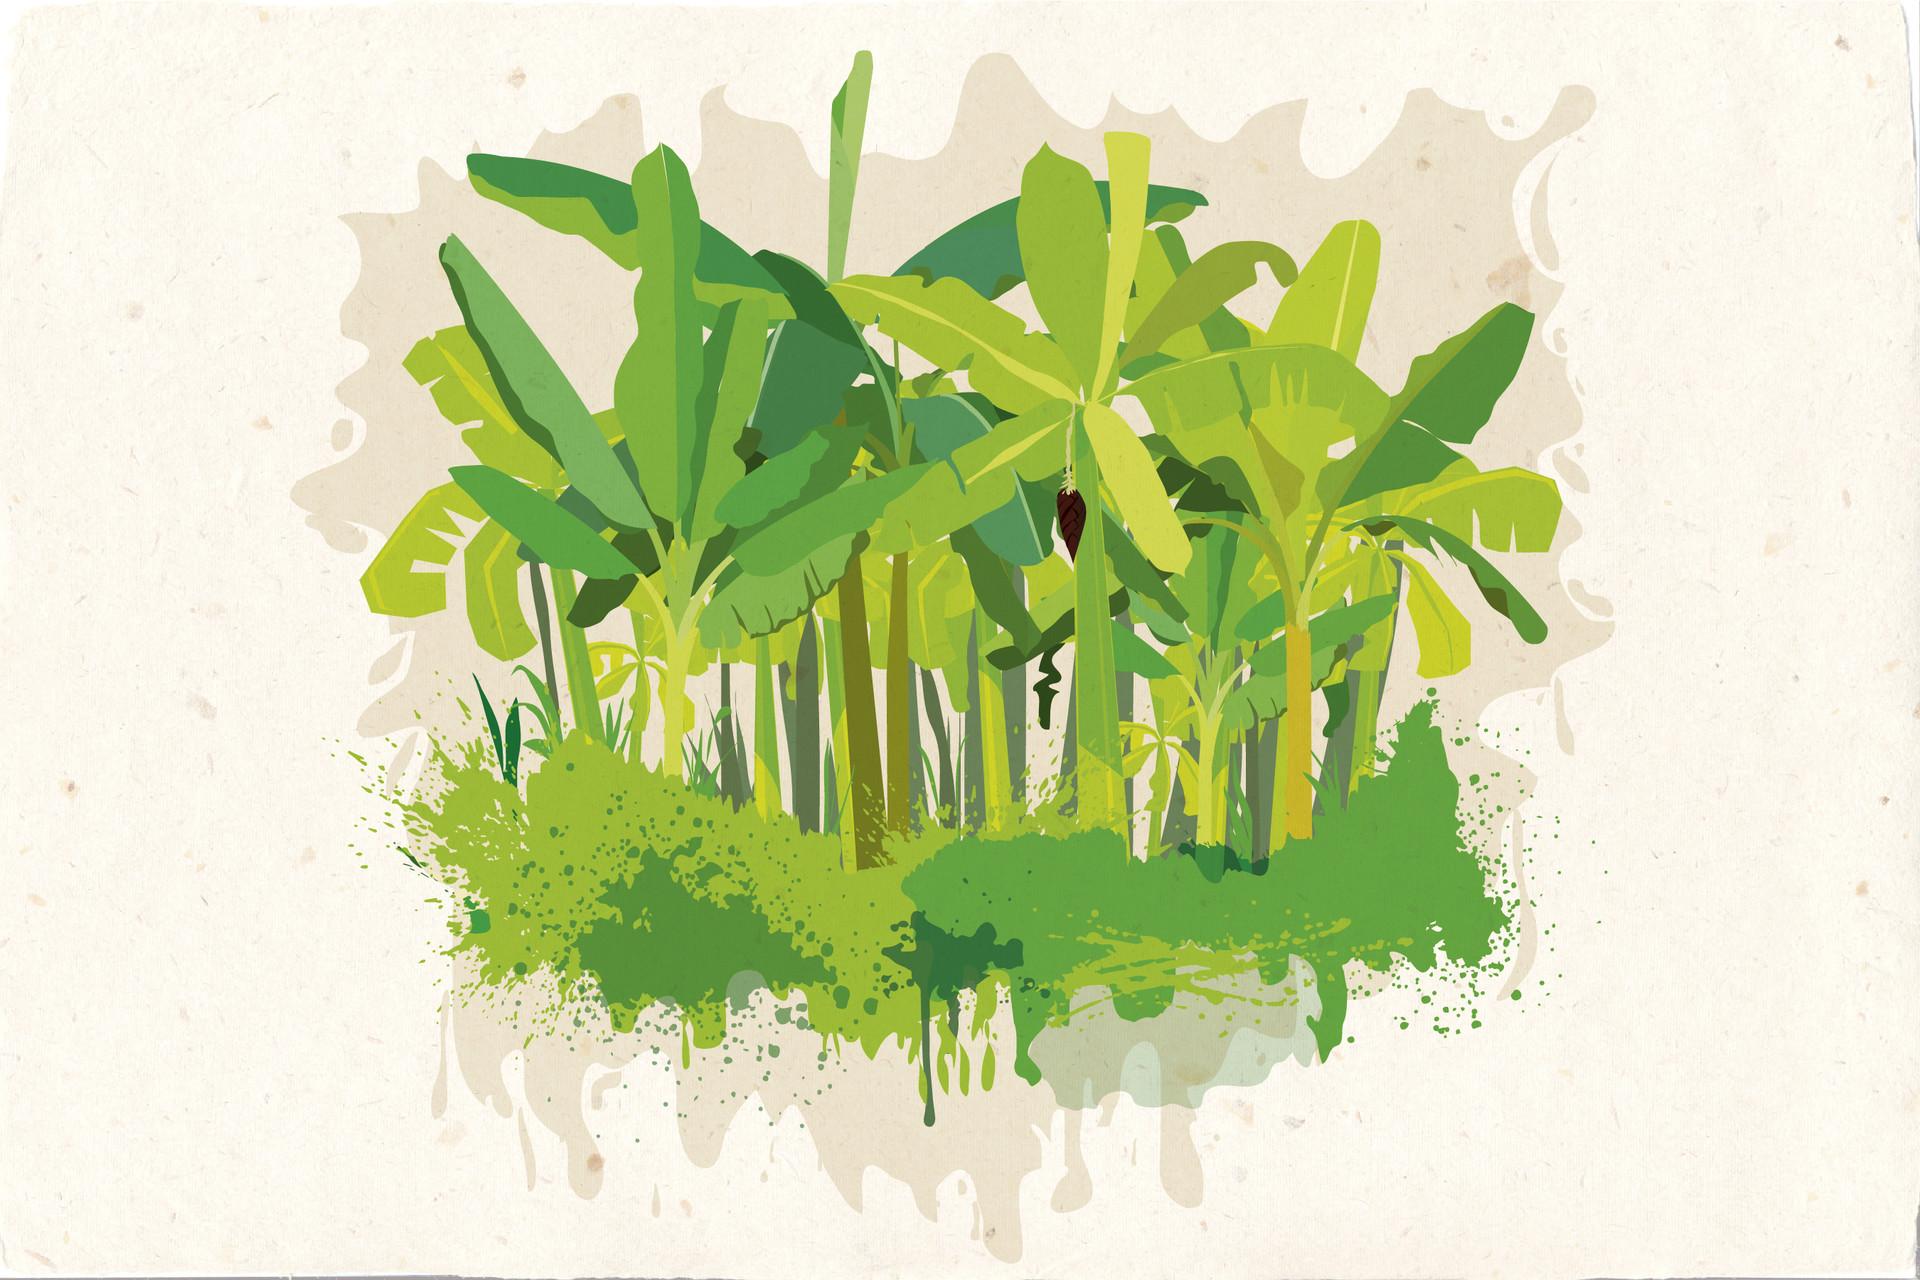 Rajesh r sawant banana trees 12 x 18 01